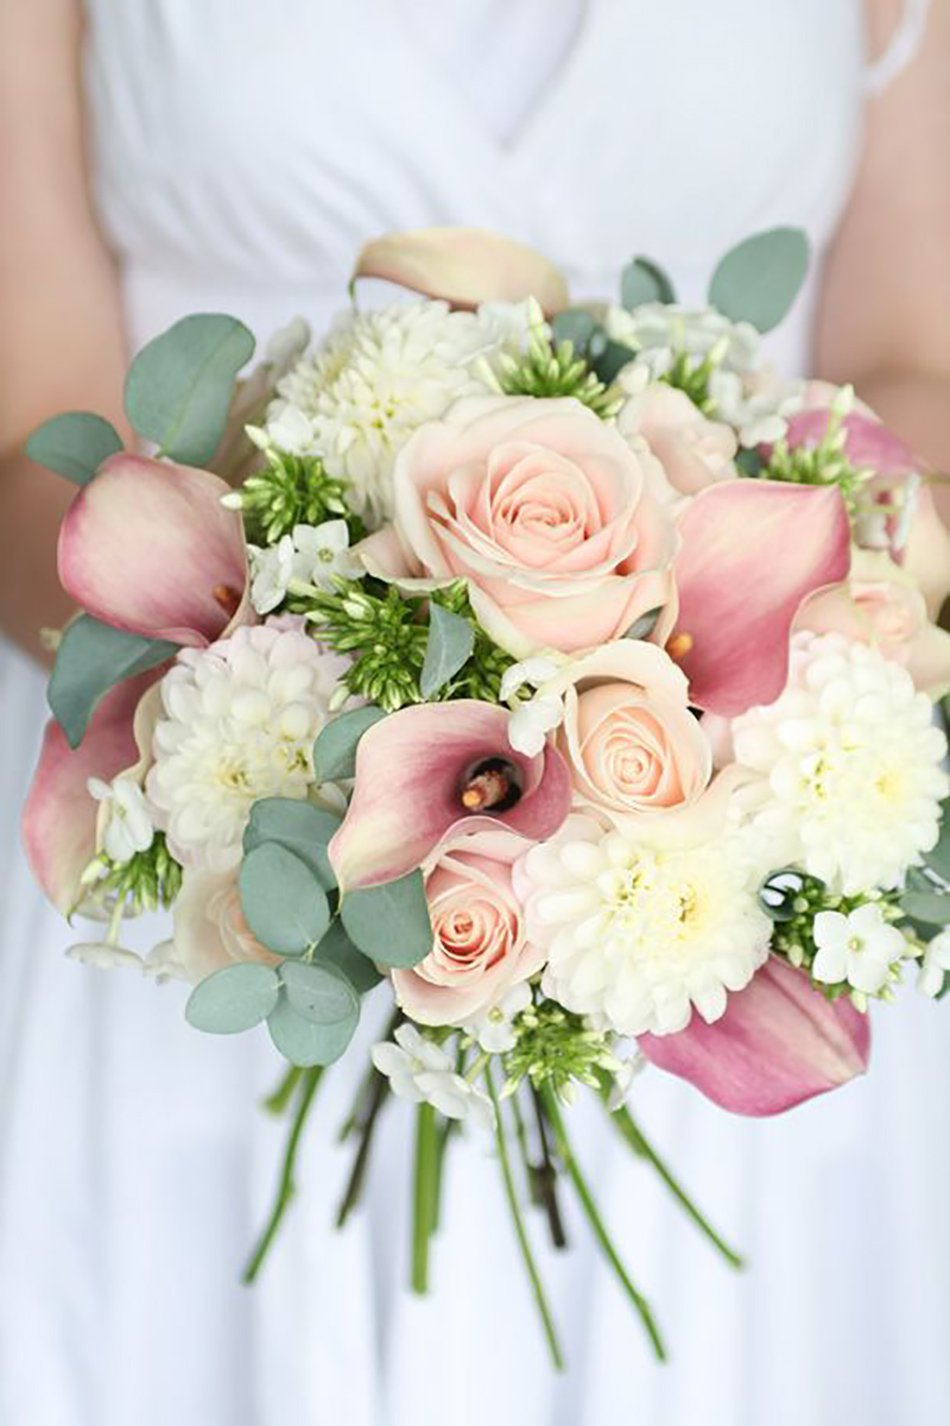 pics of wedding bouquets photo - 1